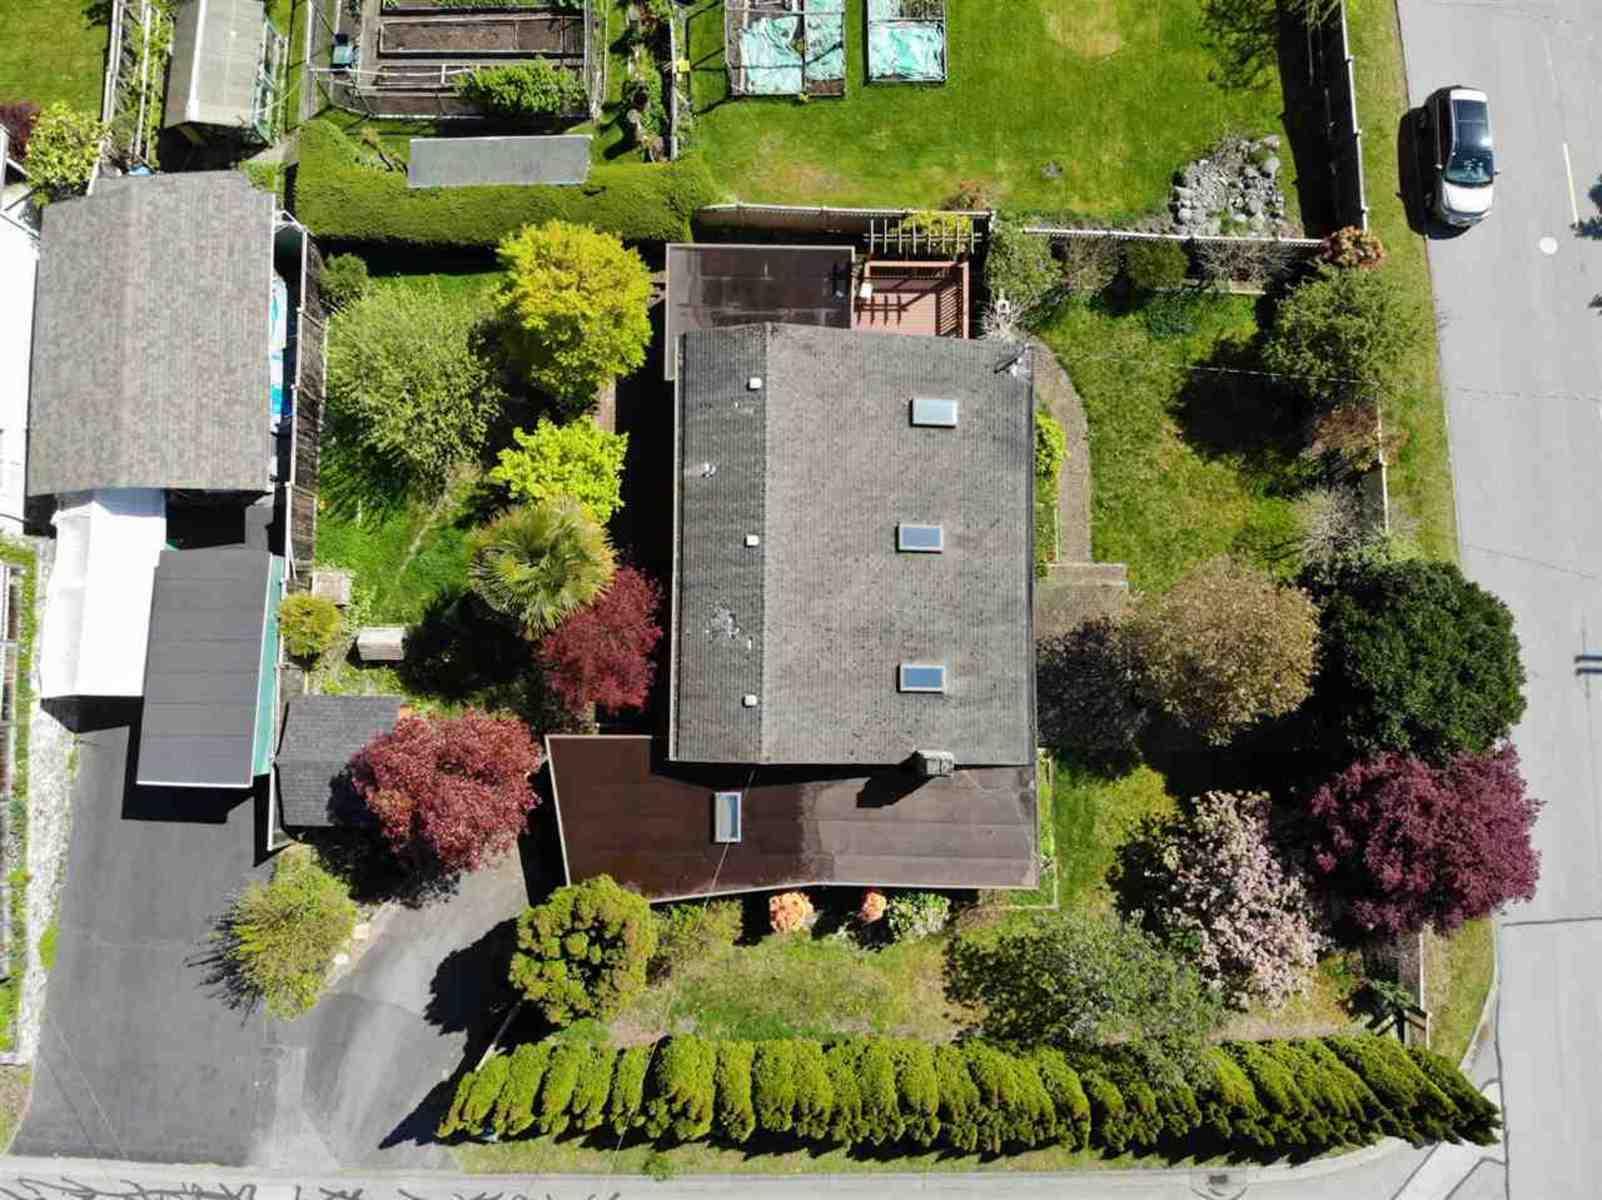 4364-dollar-road-dollarton-north-vancouver-03 at 4364 Dollar Road, Dollarton, North Vancouver